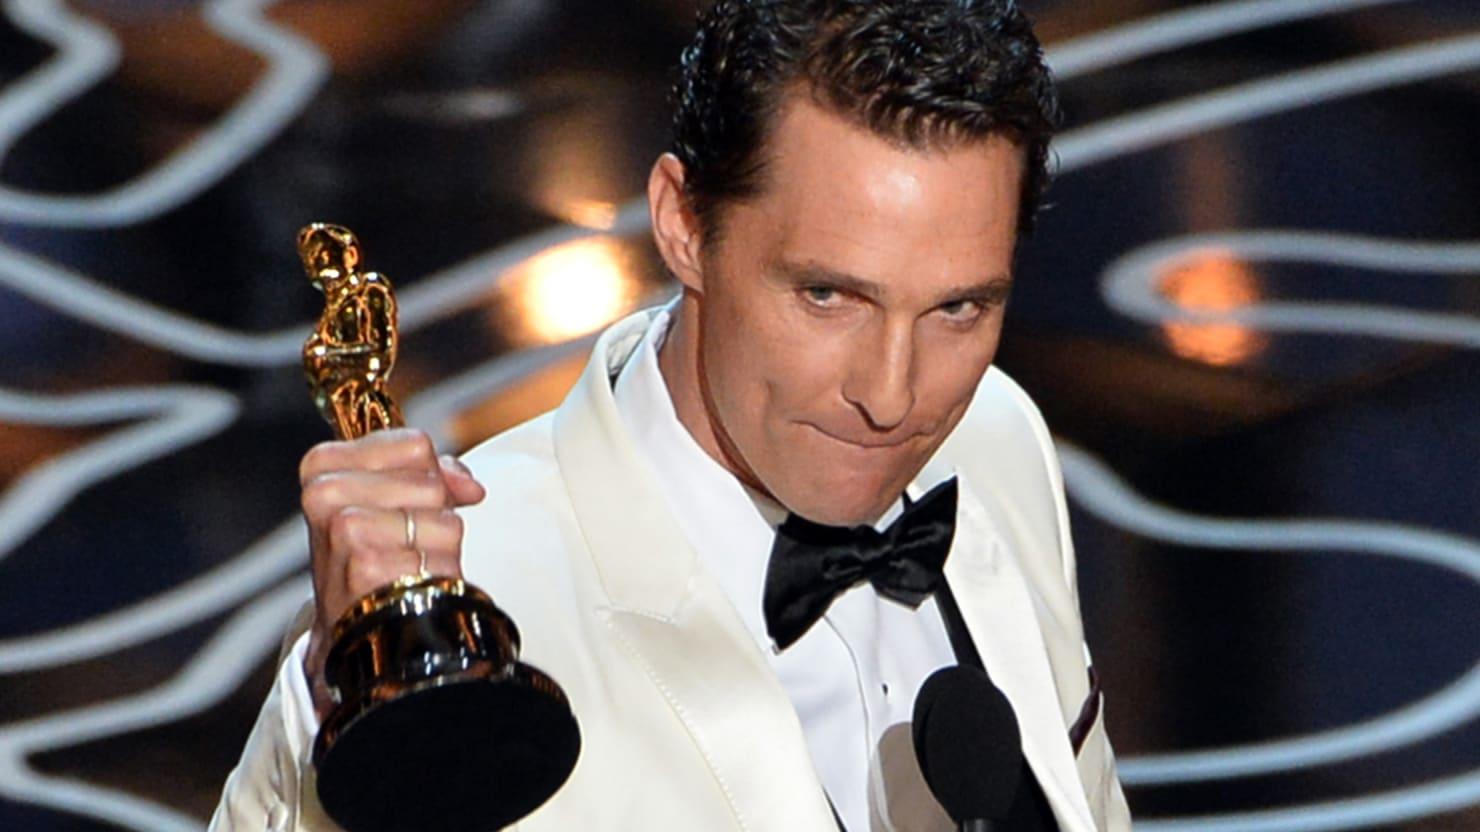 Matthew McConaughey's God Moment